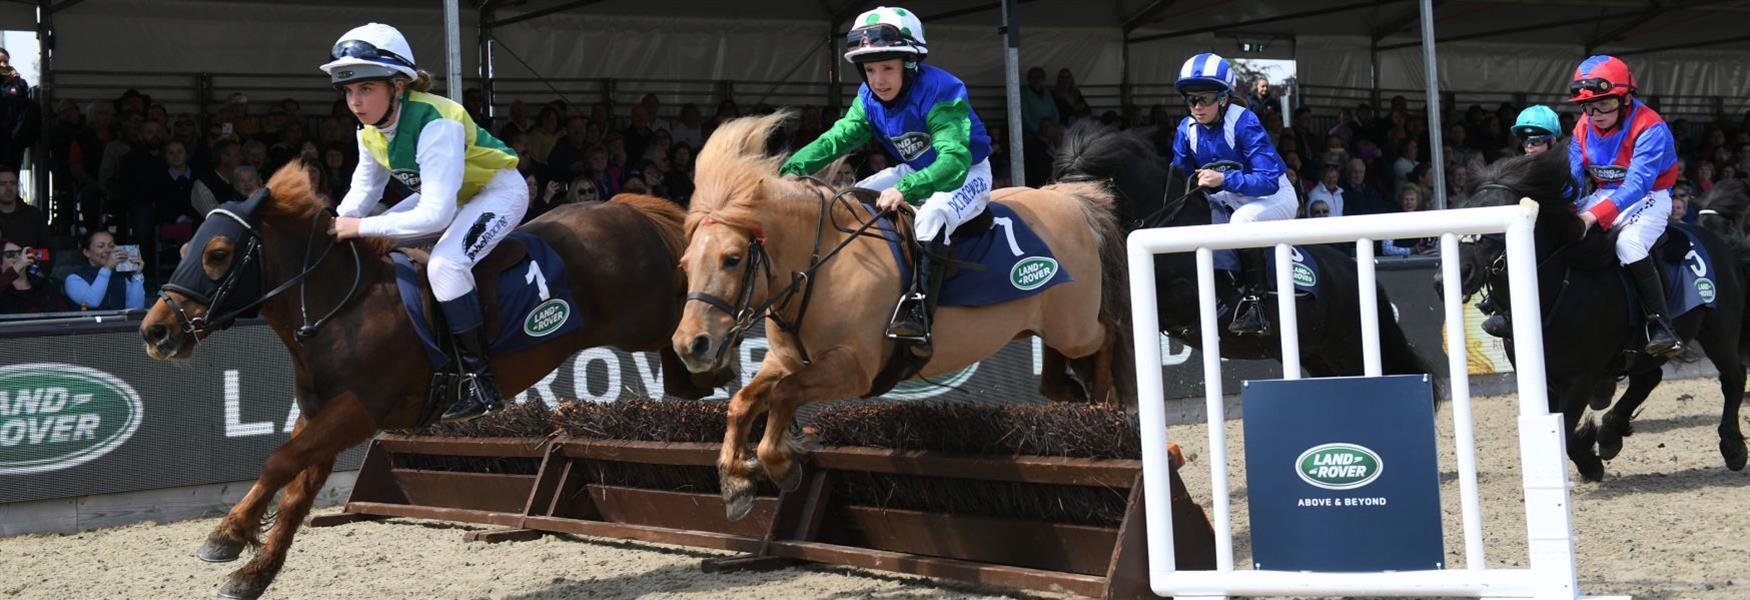 Shetland Pony Grand National, Royal Windsor Horse Show